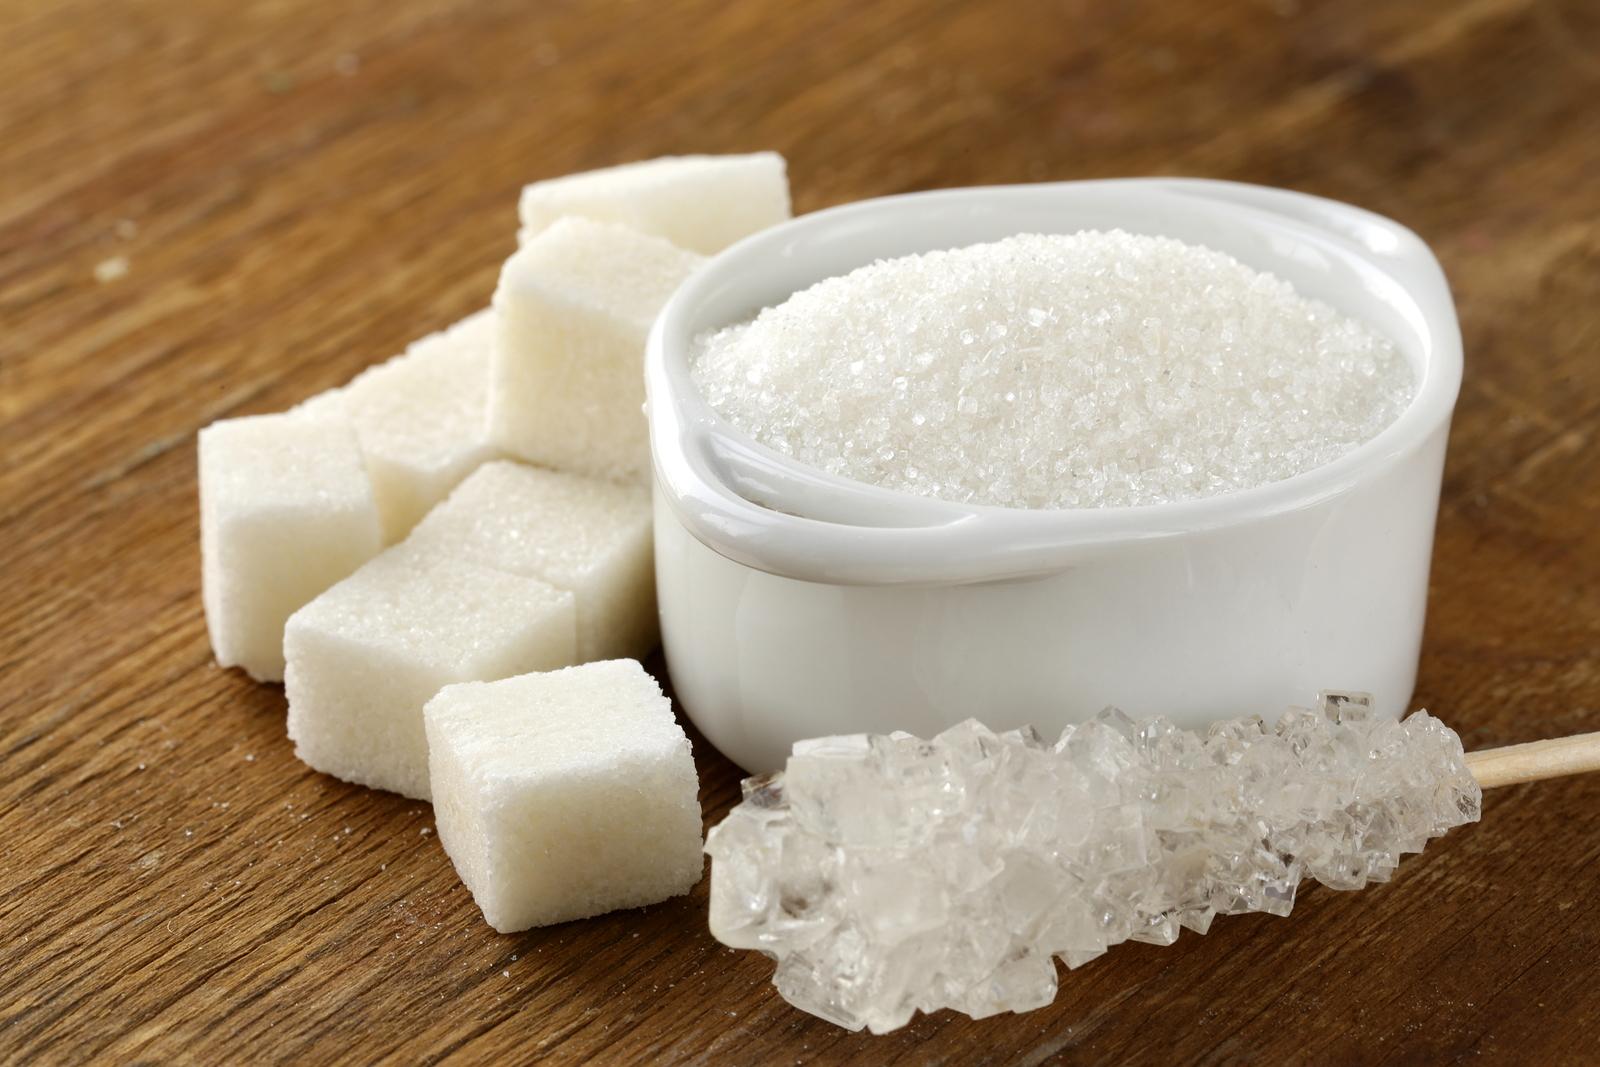 Several types of white sugar - refined sugar and granulated suga